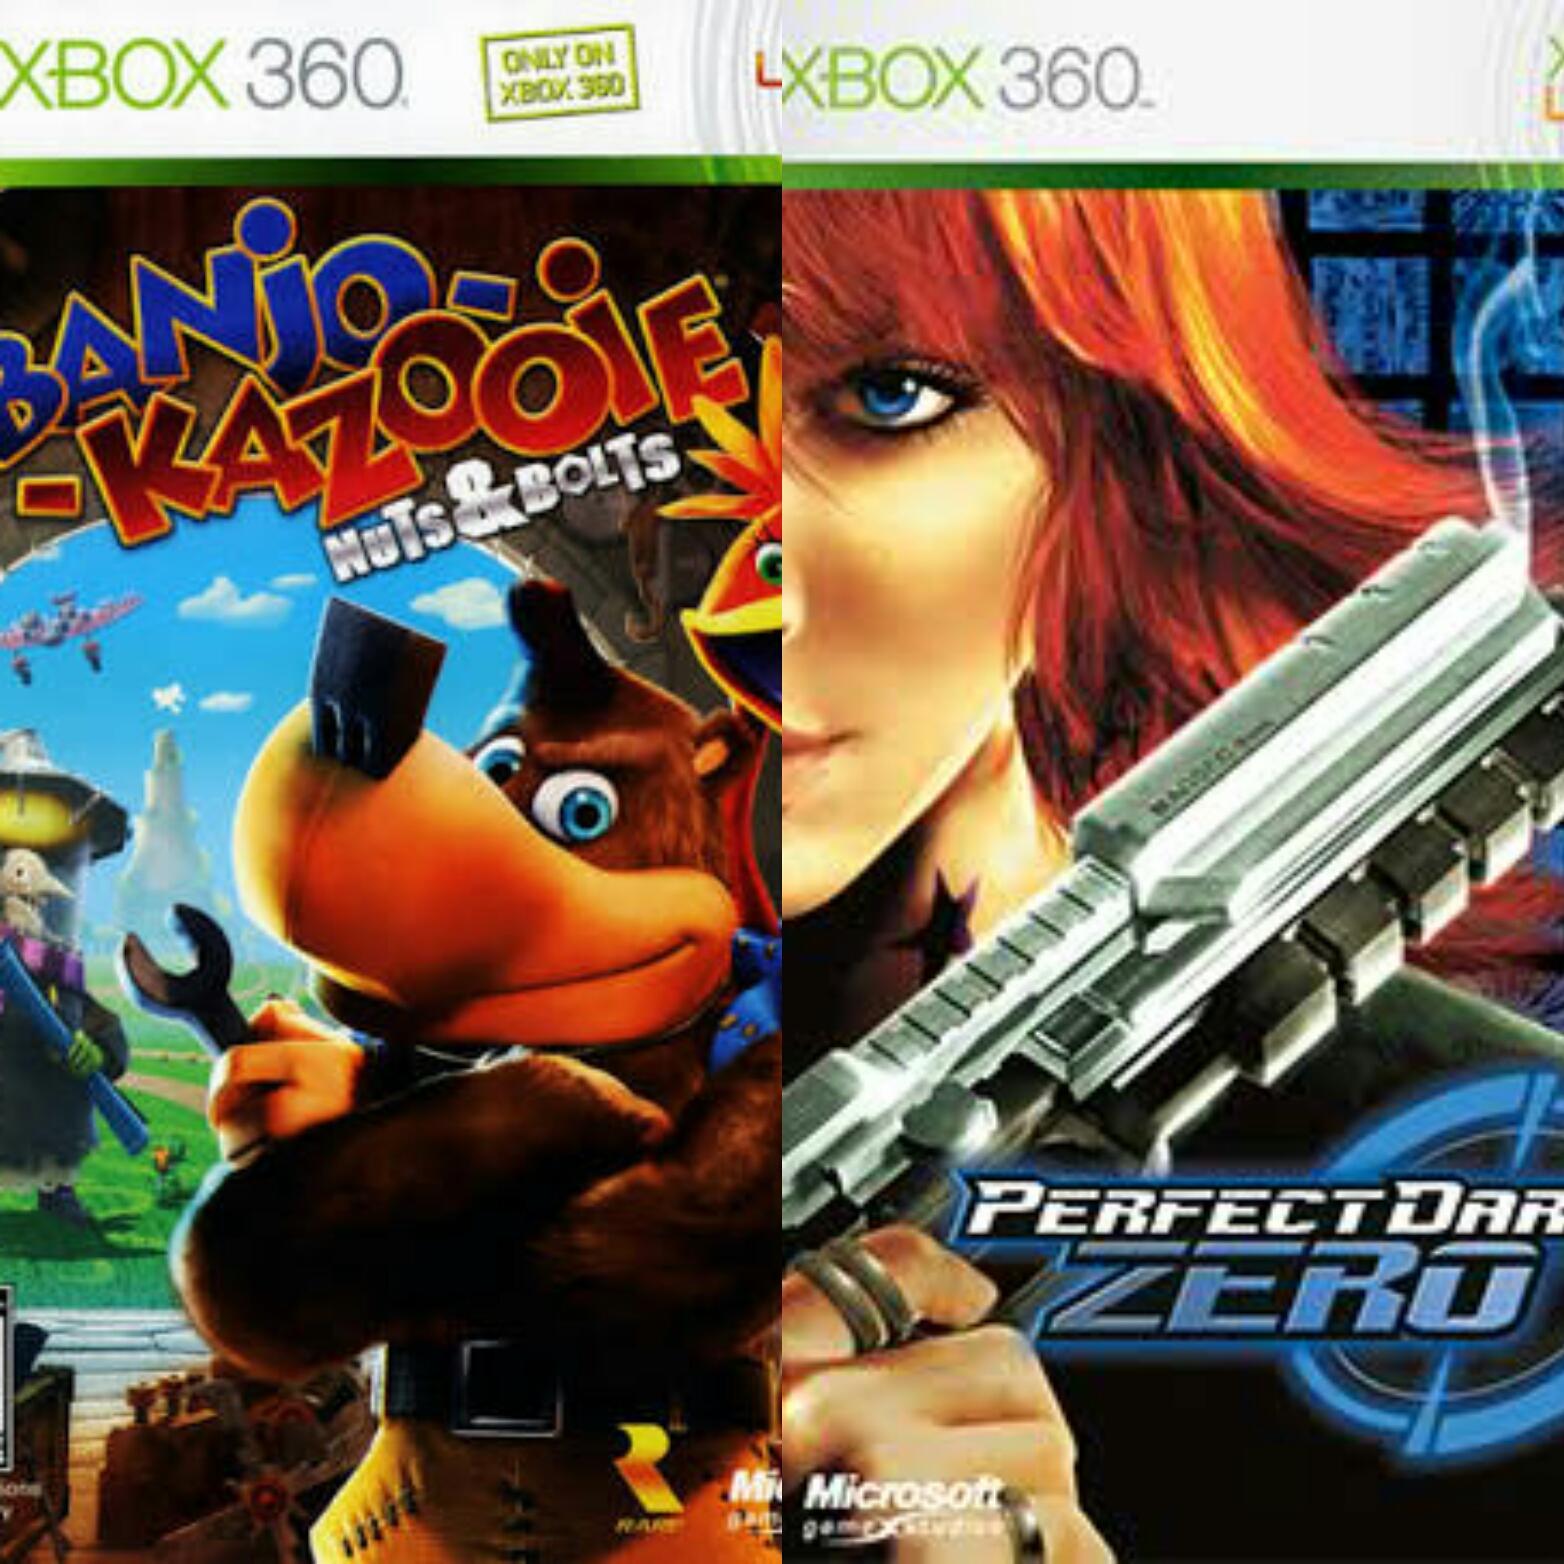 The Cream of the Crap - Perfect Dark Zero and Banjo-Kazooie: Nuts & Bolts (Xbox 360)